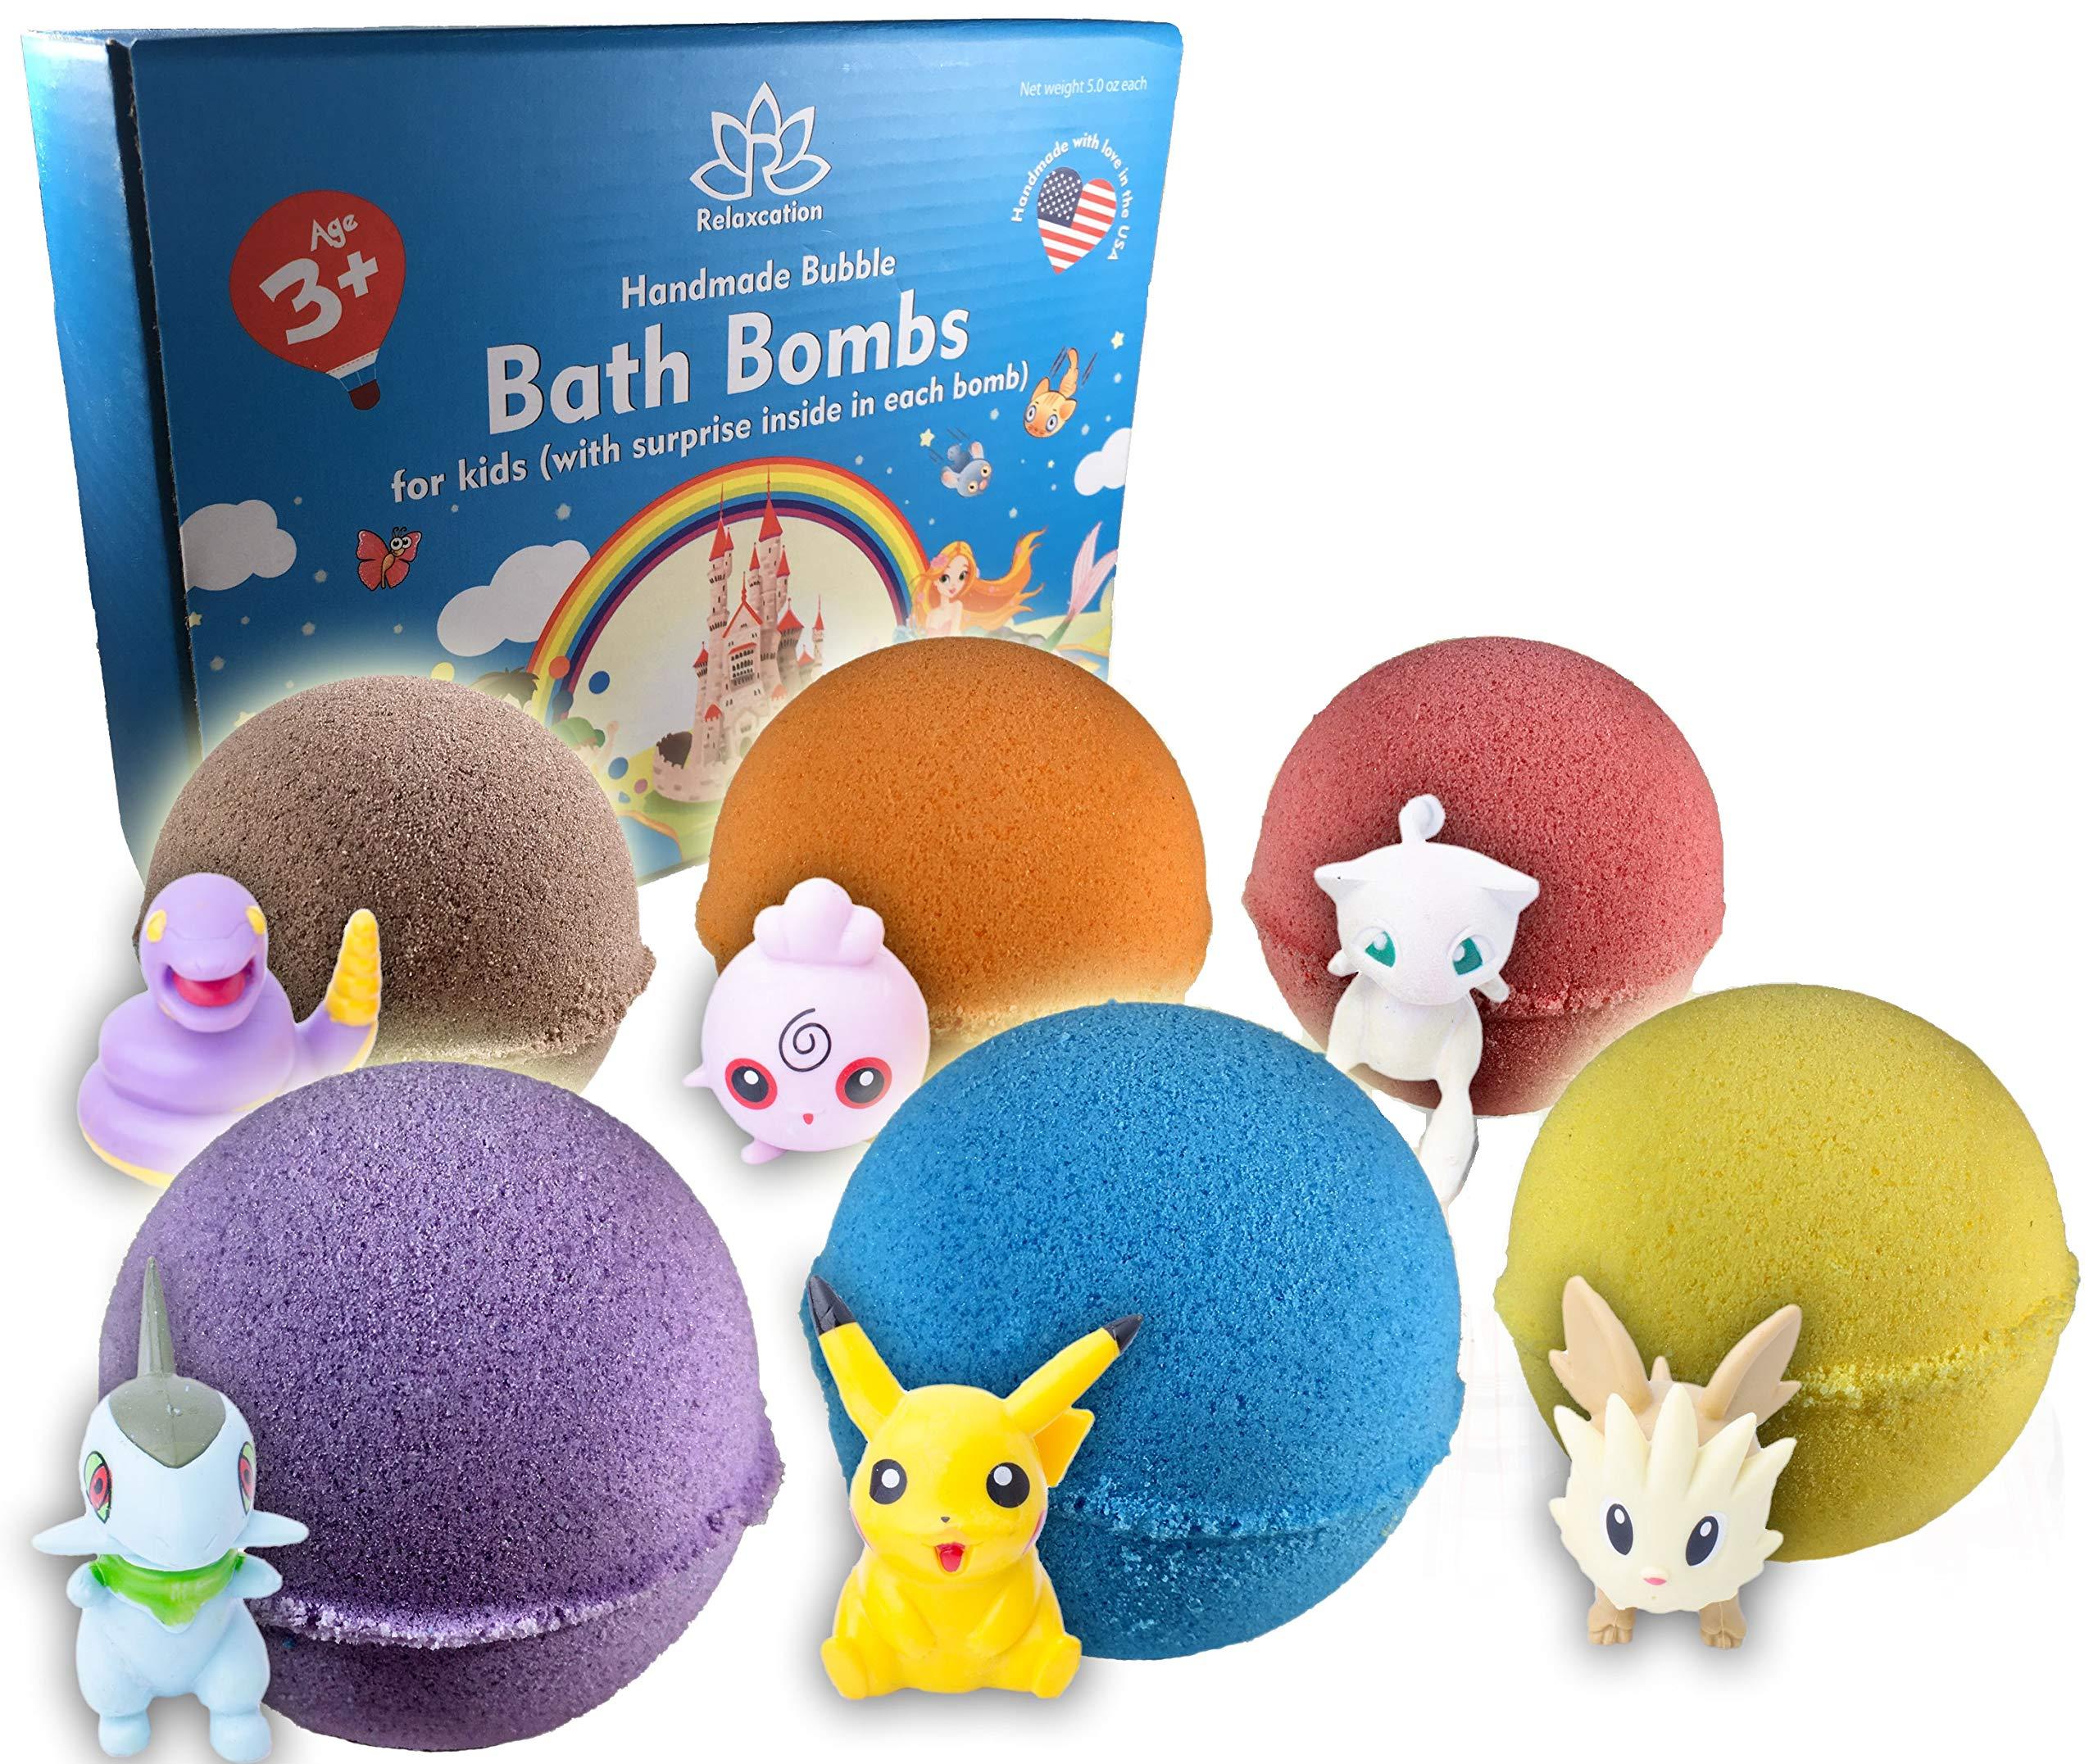 Bath Bombs For Kids with POKEMON TOYS INSIDE/Kids Bath Bombs with Surprises - Bath Bomb Kit for Girls & Boys - Multicolored Bubble Bath Bombs - Natural Safe (Bath Bombs Pokemon)